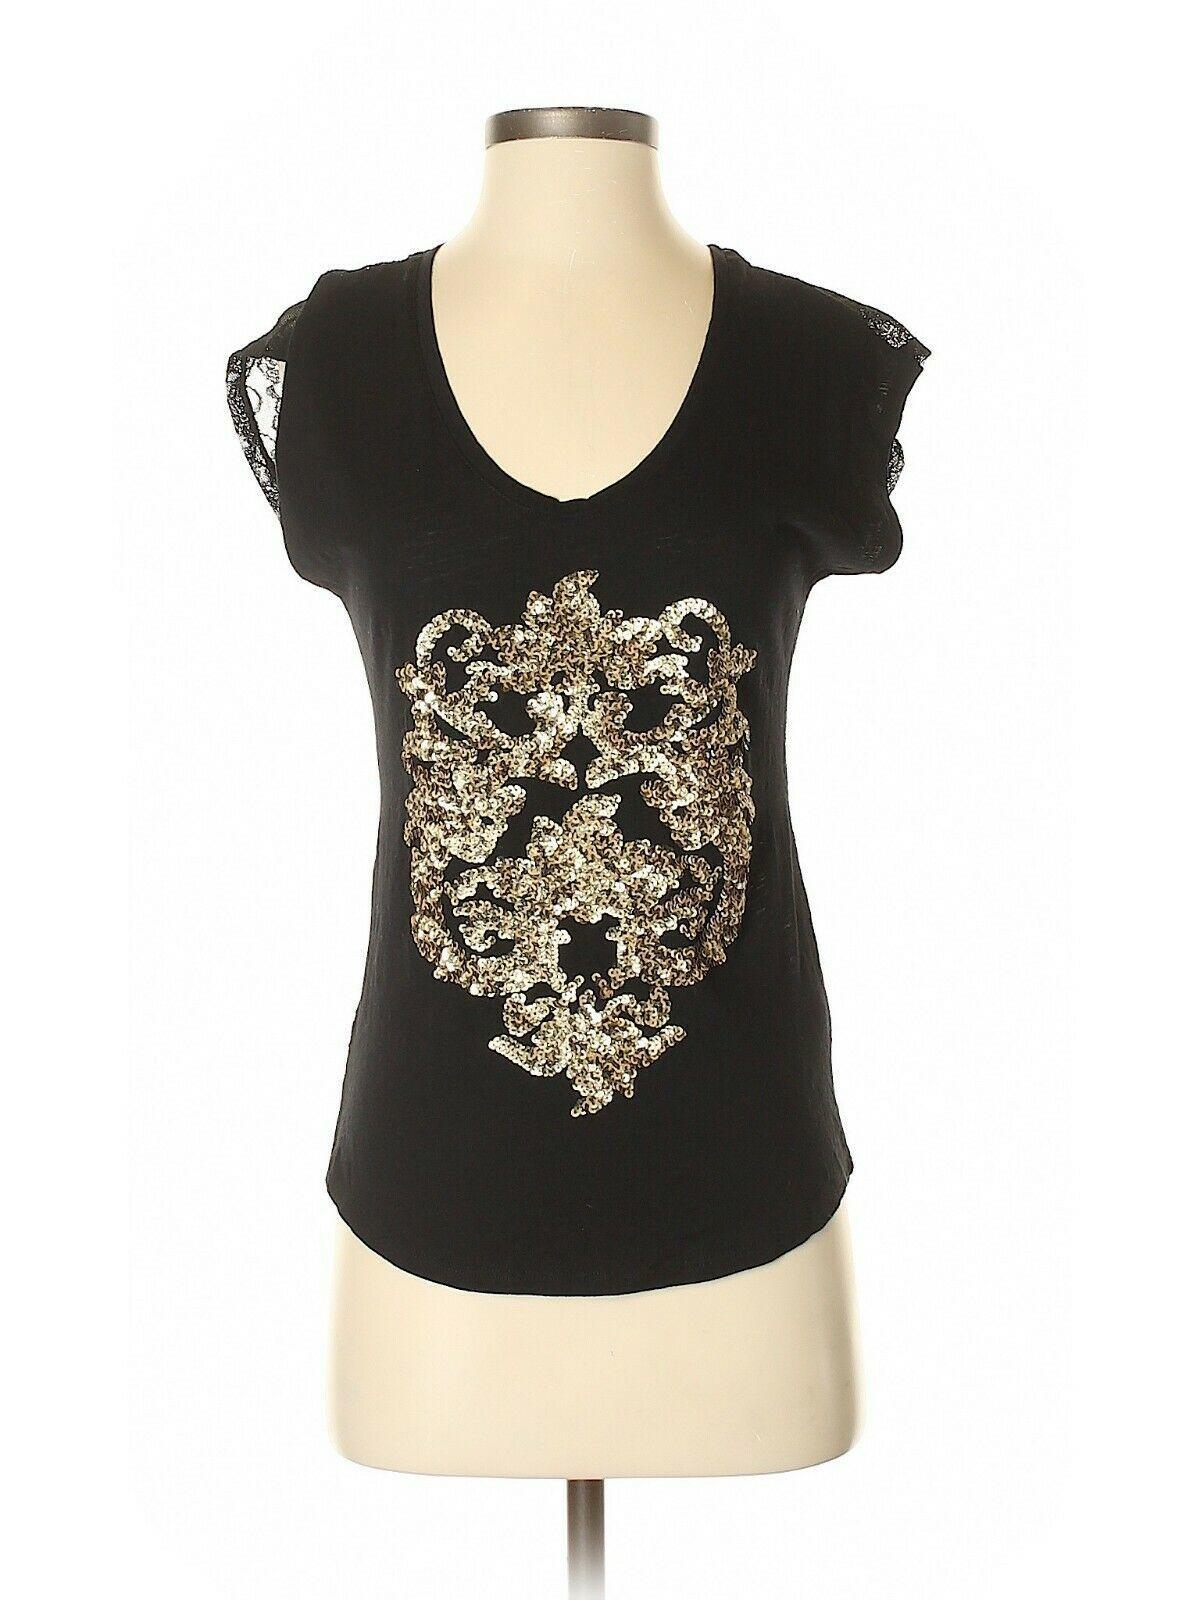 Express Women's Crop Top Black Lace Keyhole Back Sleeveless Size Medium